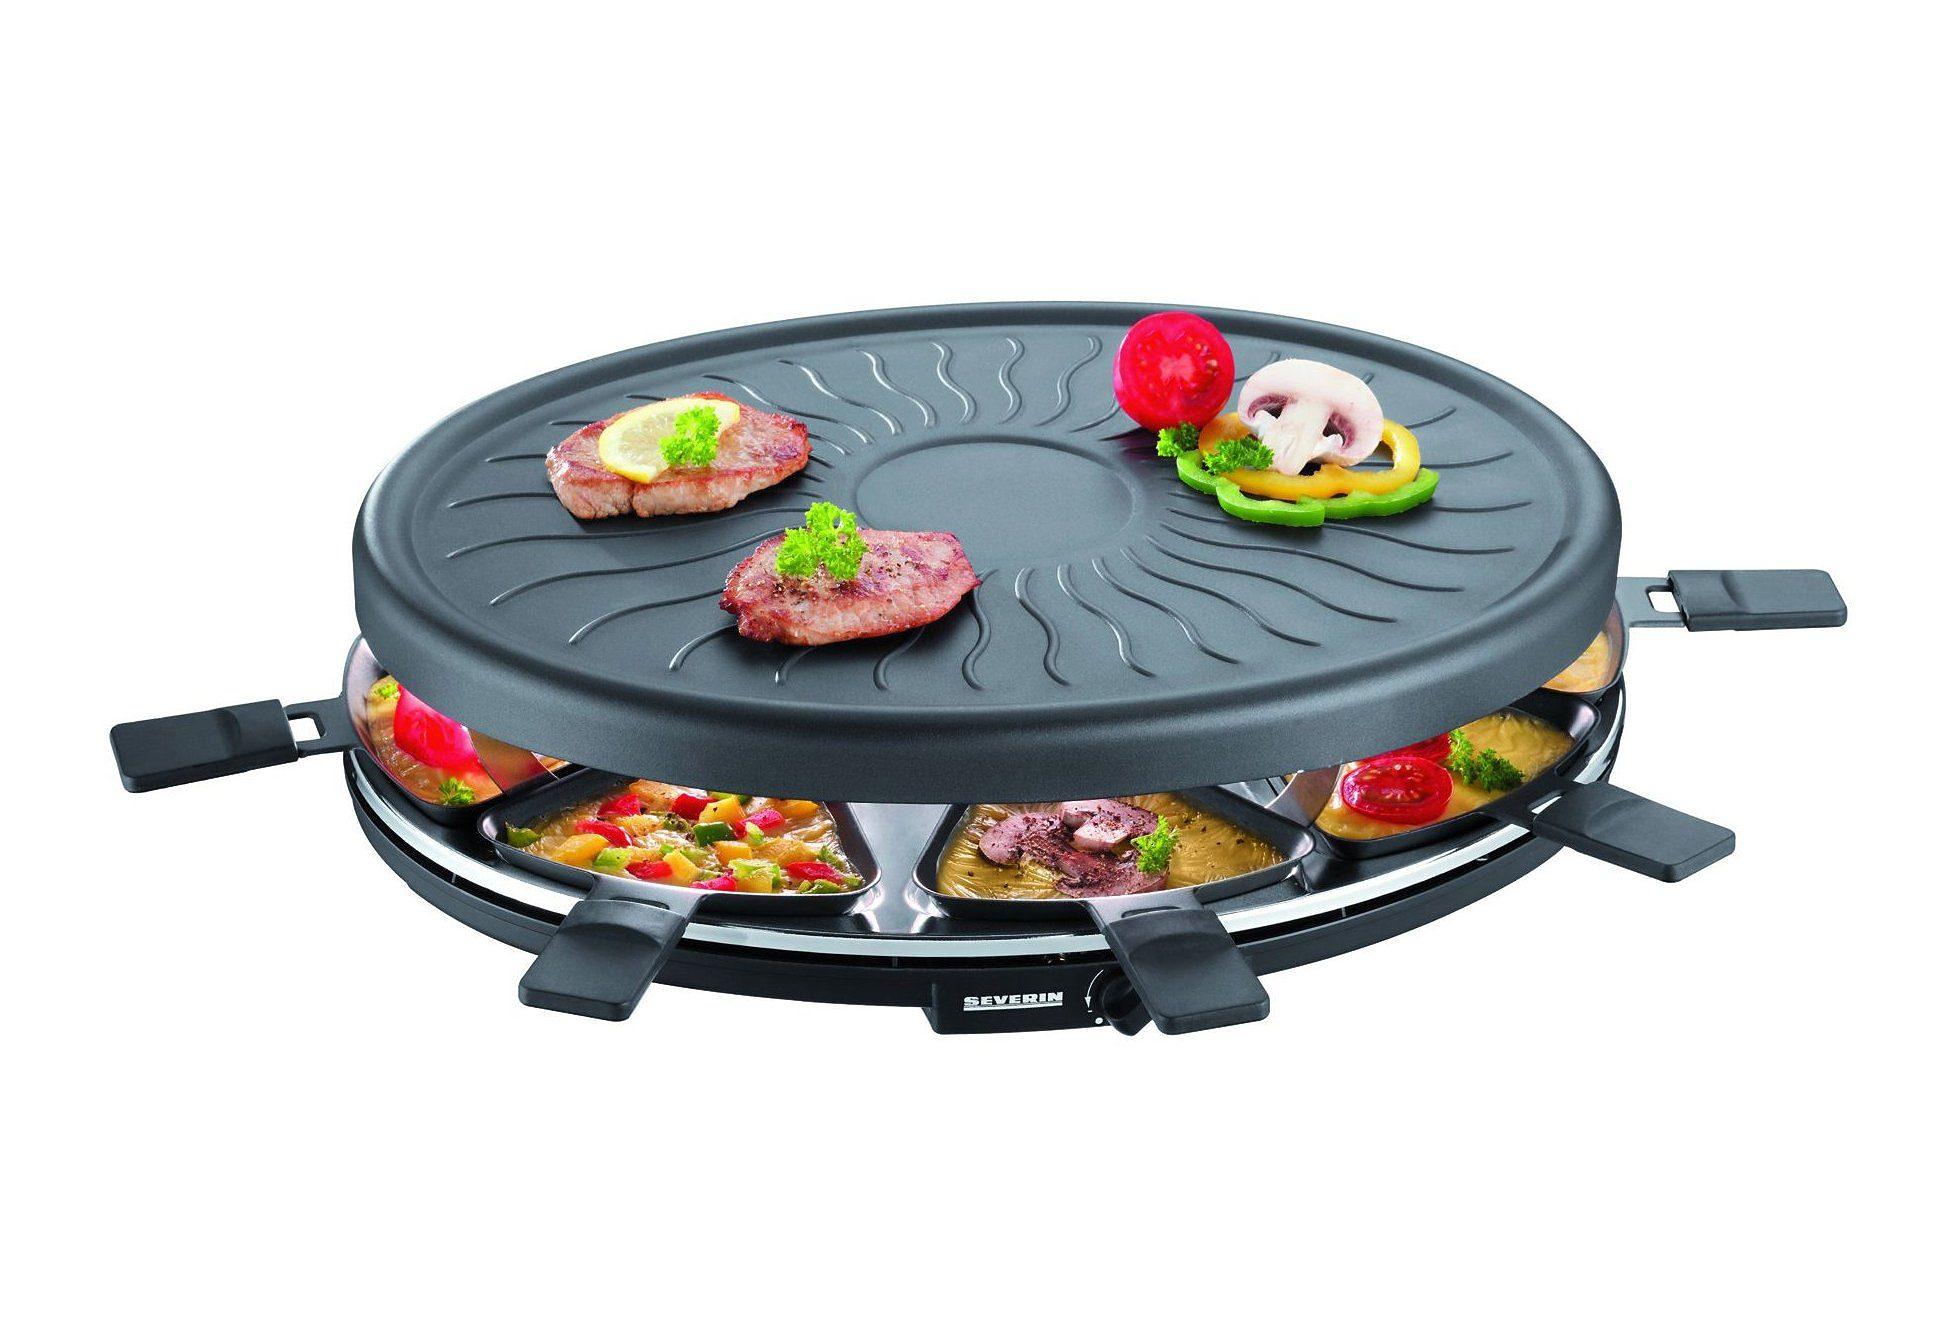 Severin Elektrogrill Bedienungsanleitung : Severin pg barbecue grill inklusiv ball amazon garten